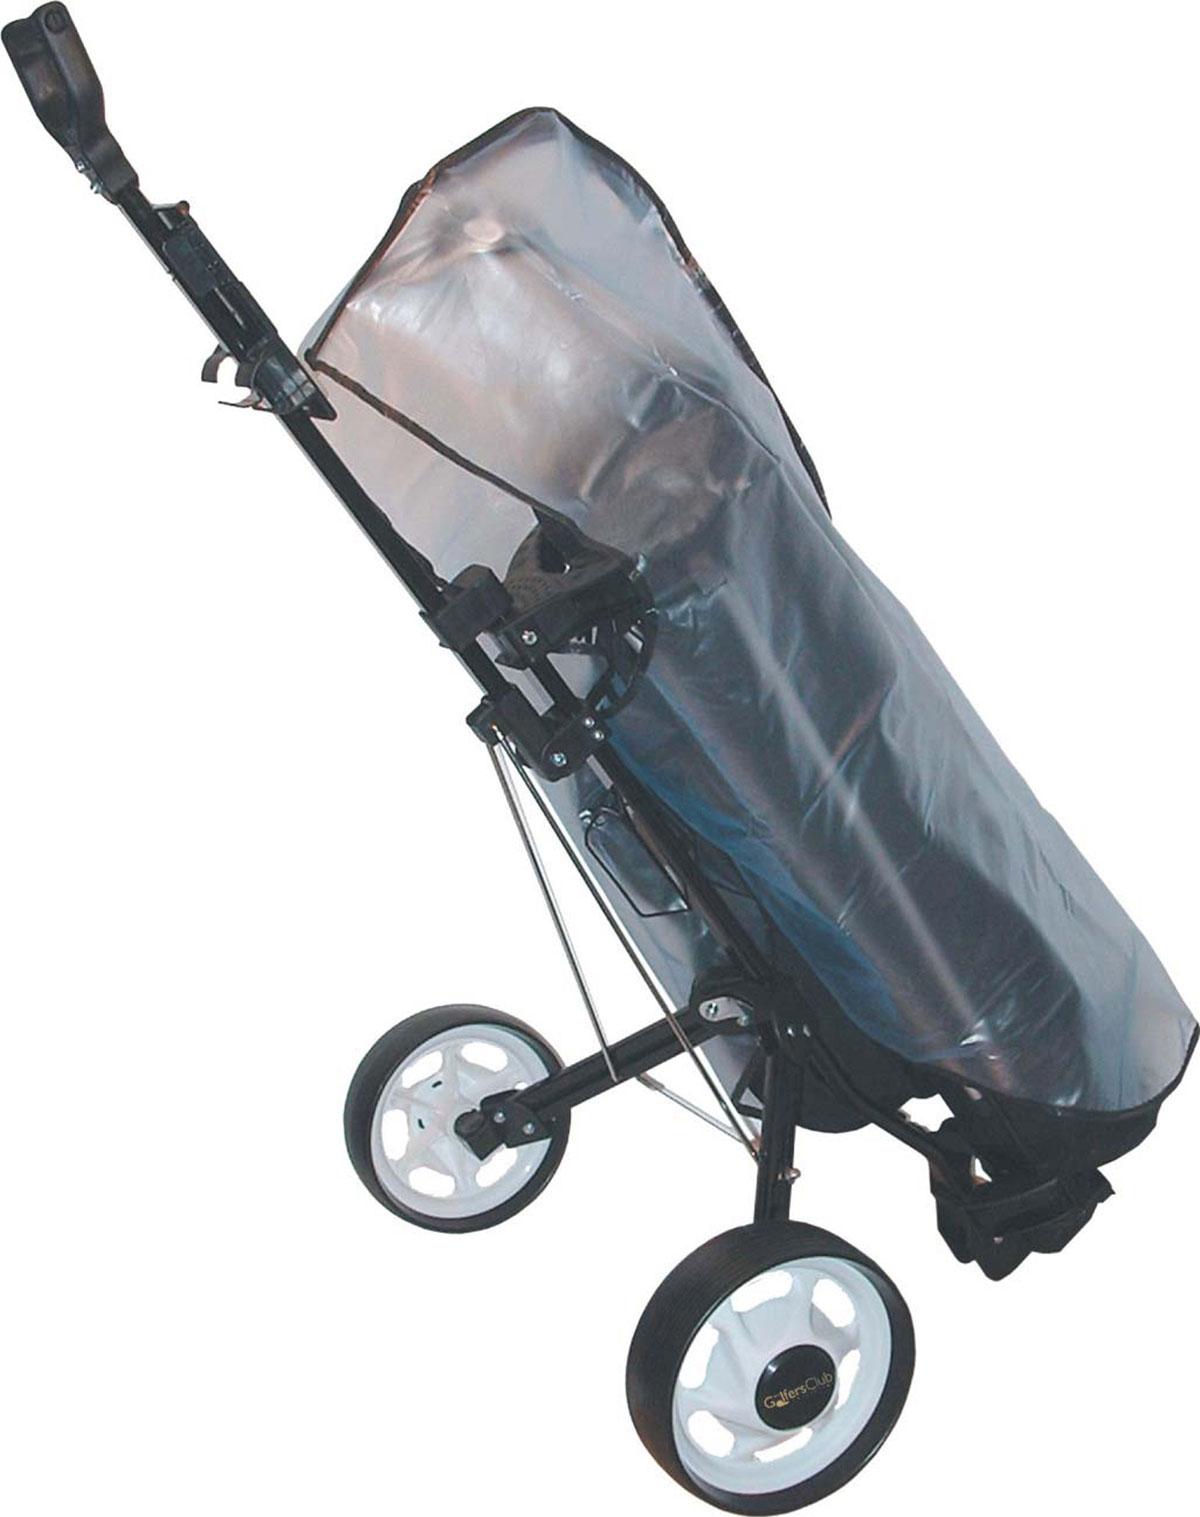 Transpa Golf Bag Rain Cover Product On Alibaba